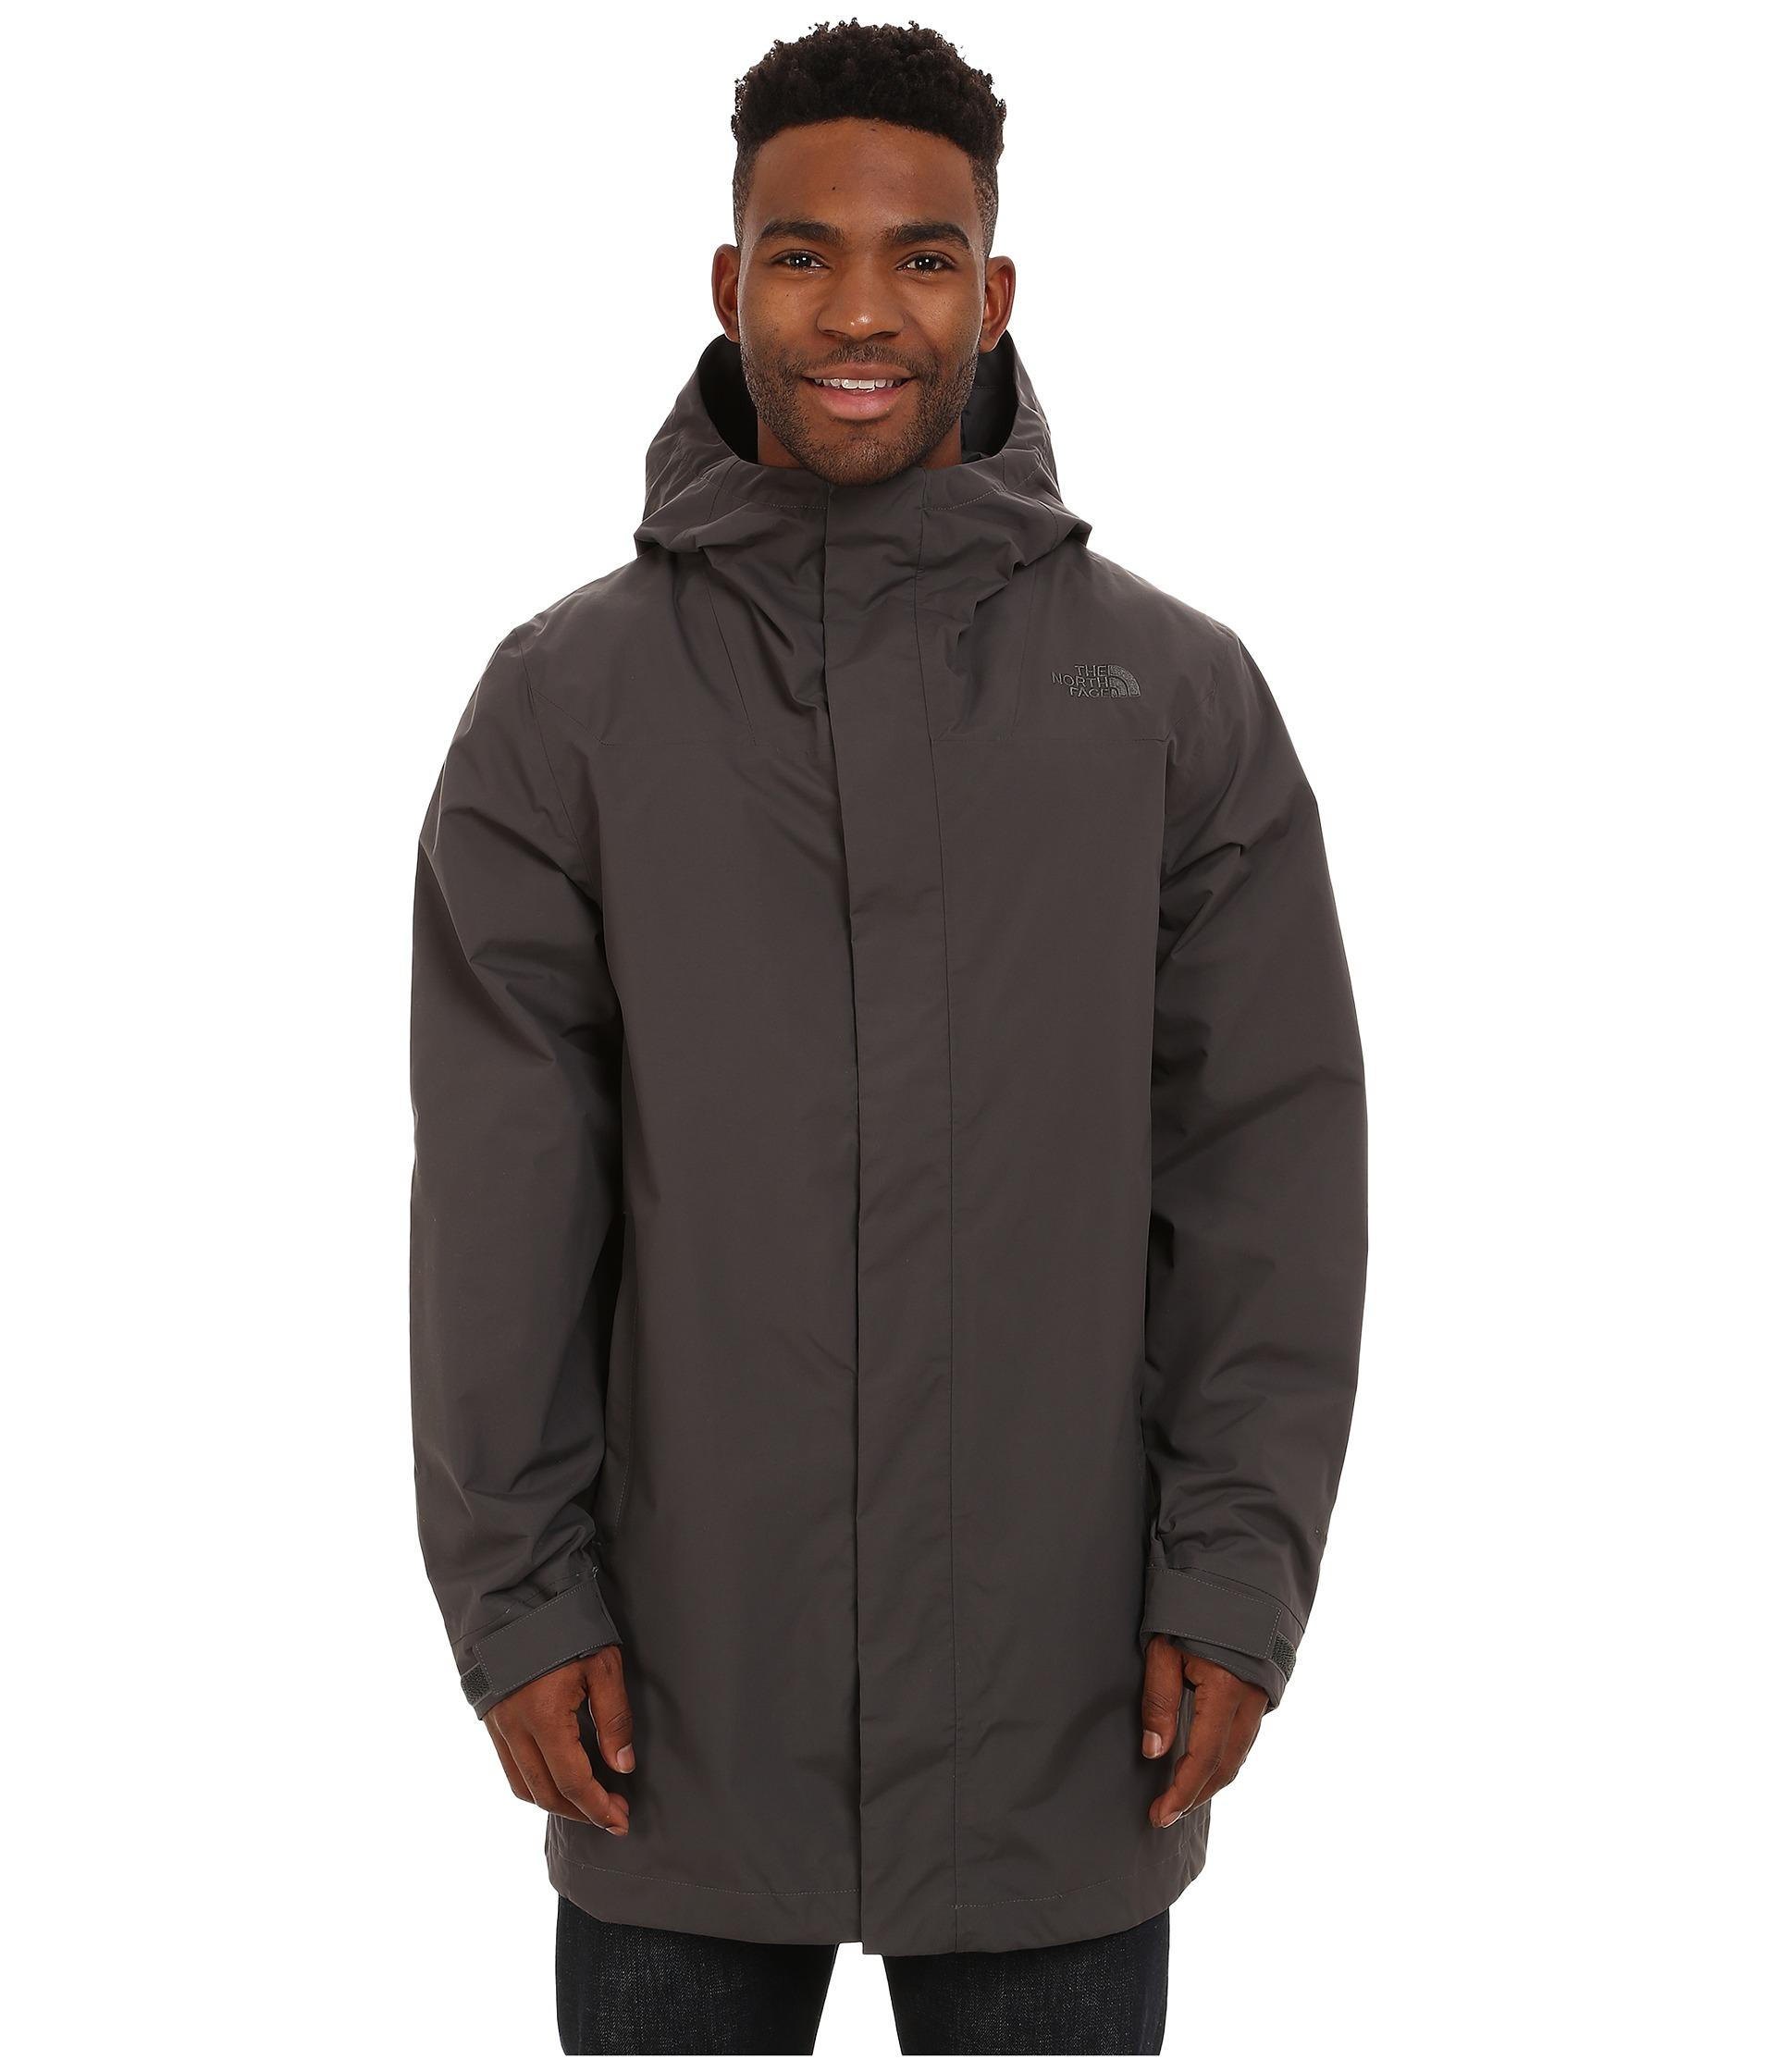 8a92ecf6b The North Face Gray El Misti Trench Coat for men